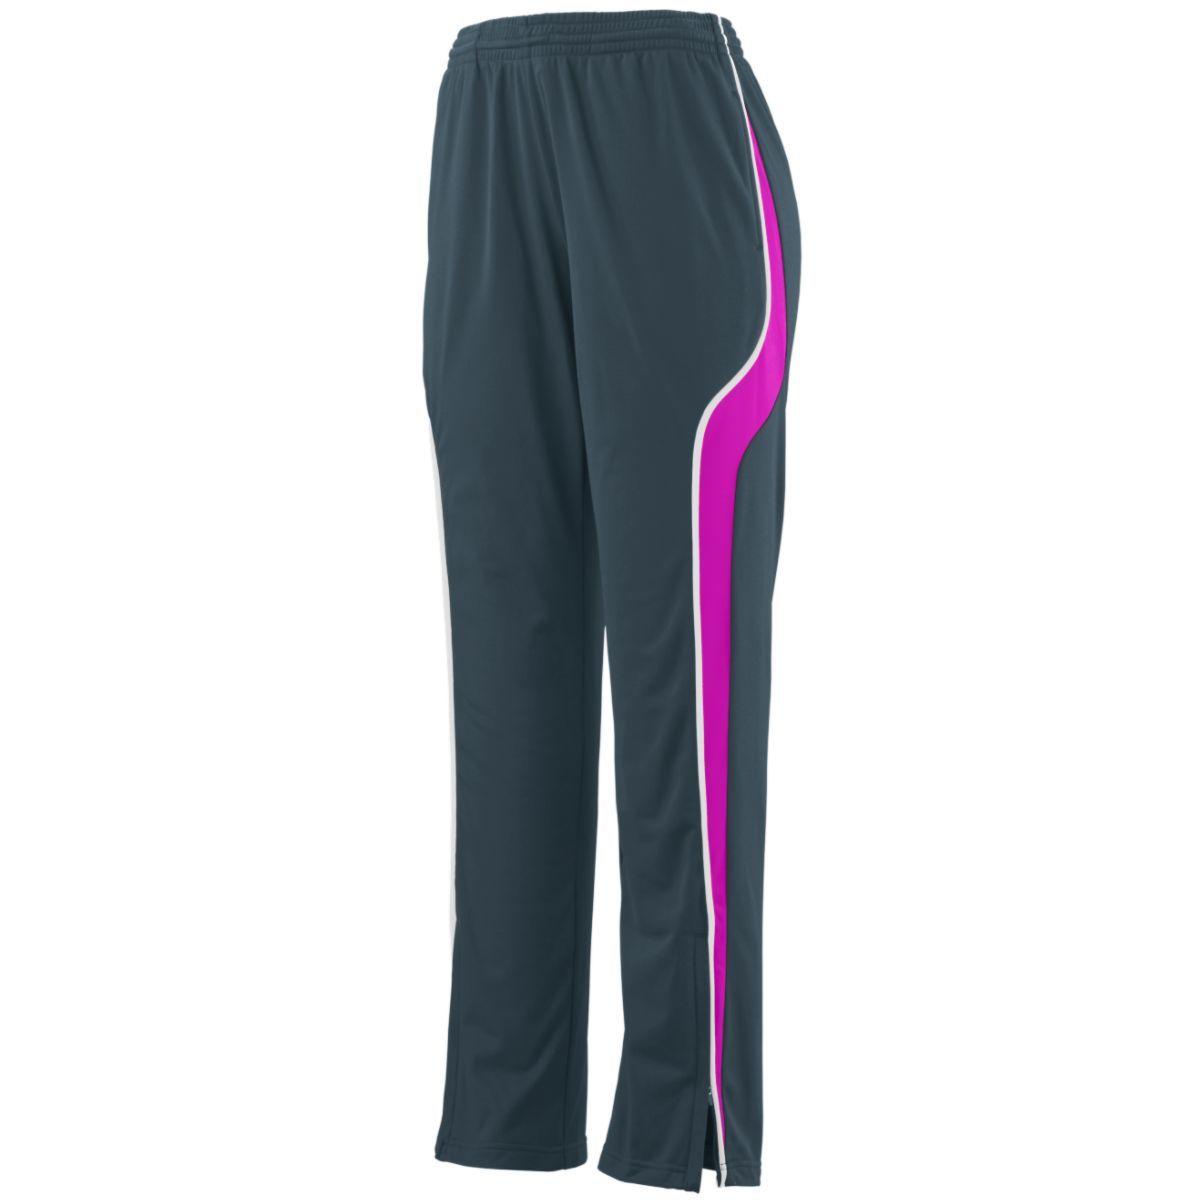 Ladies Rival Pant - SLATE/POWER PINK/WHITE